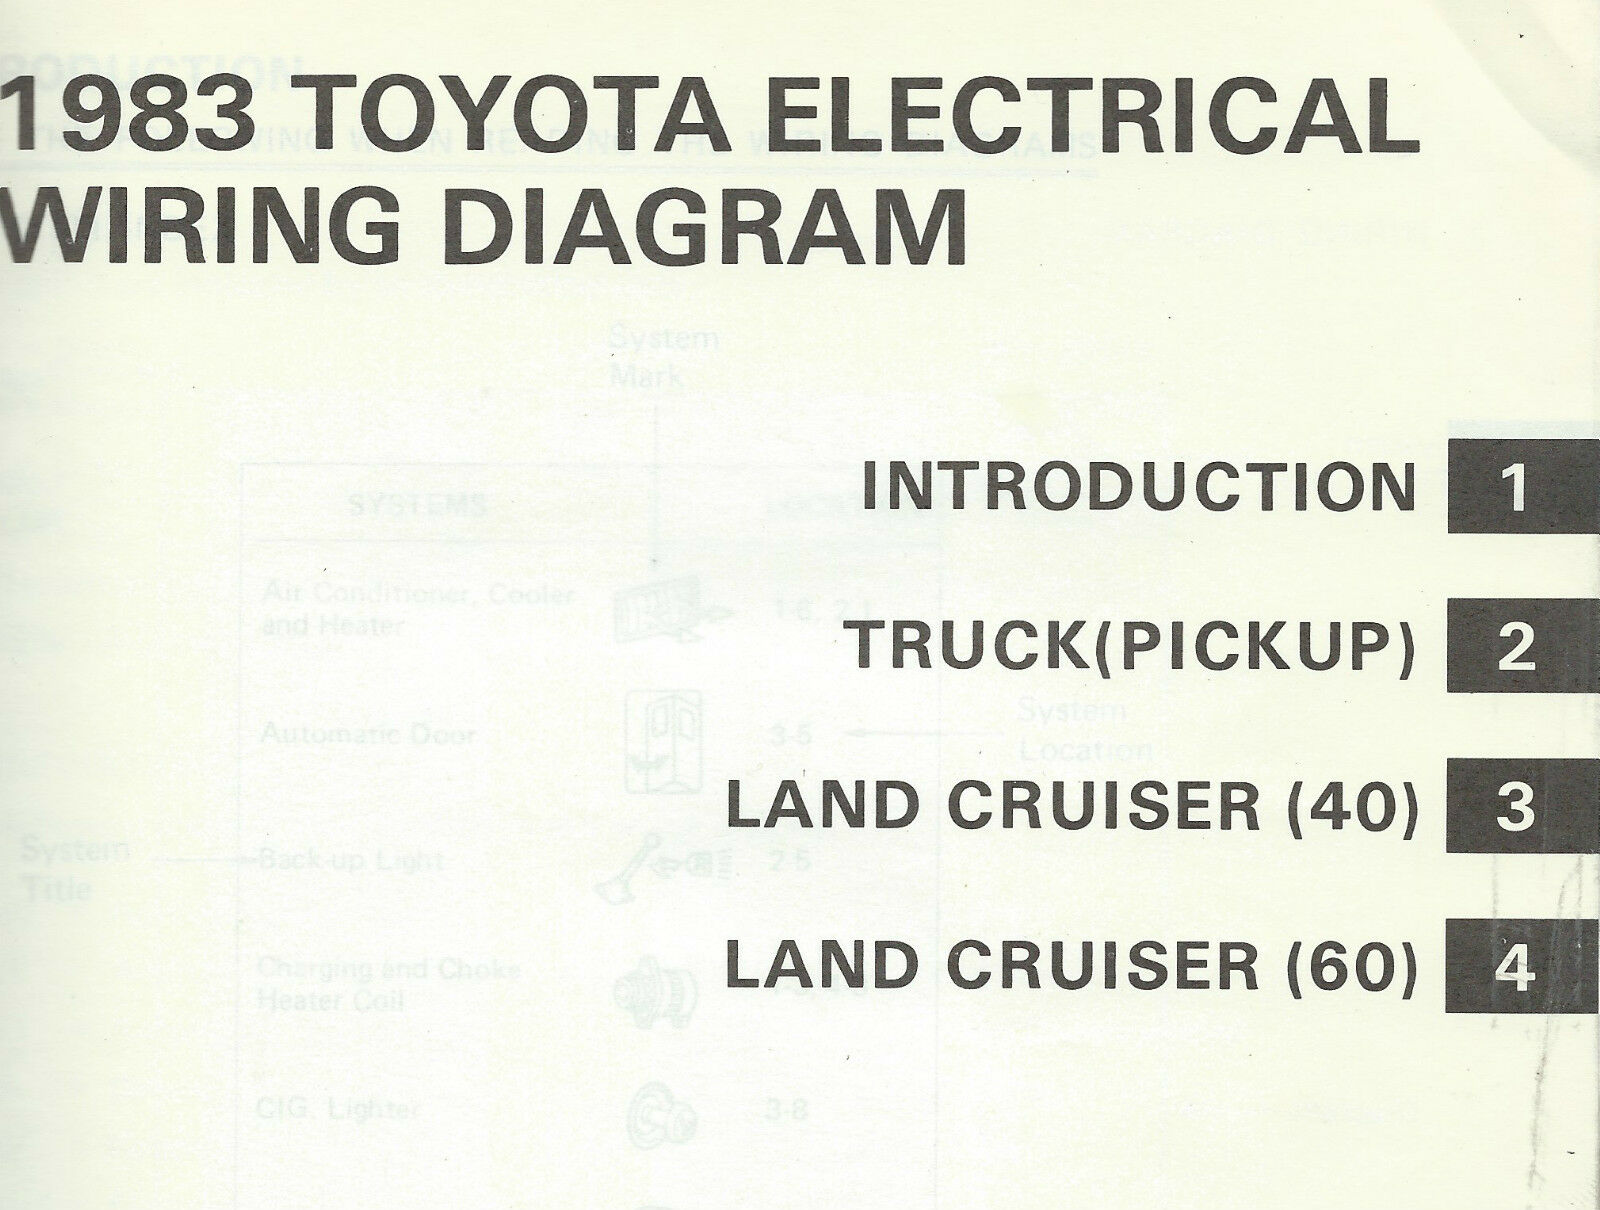 Toyota Hj60 Wiring Diagram Free And Schematics Land Cruiser Diagrams 2 Of 10 1983 Fj Bj 60 Series Electrical Repair Manual